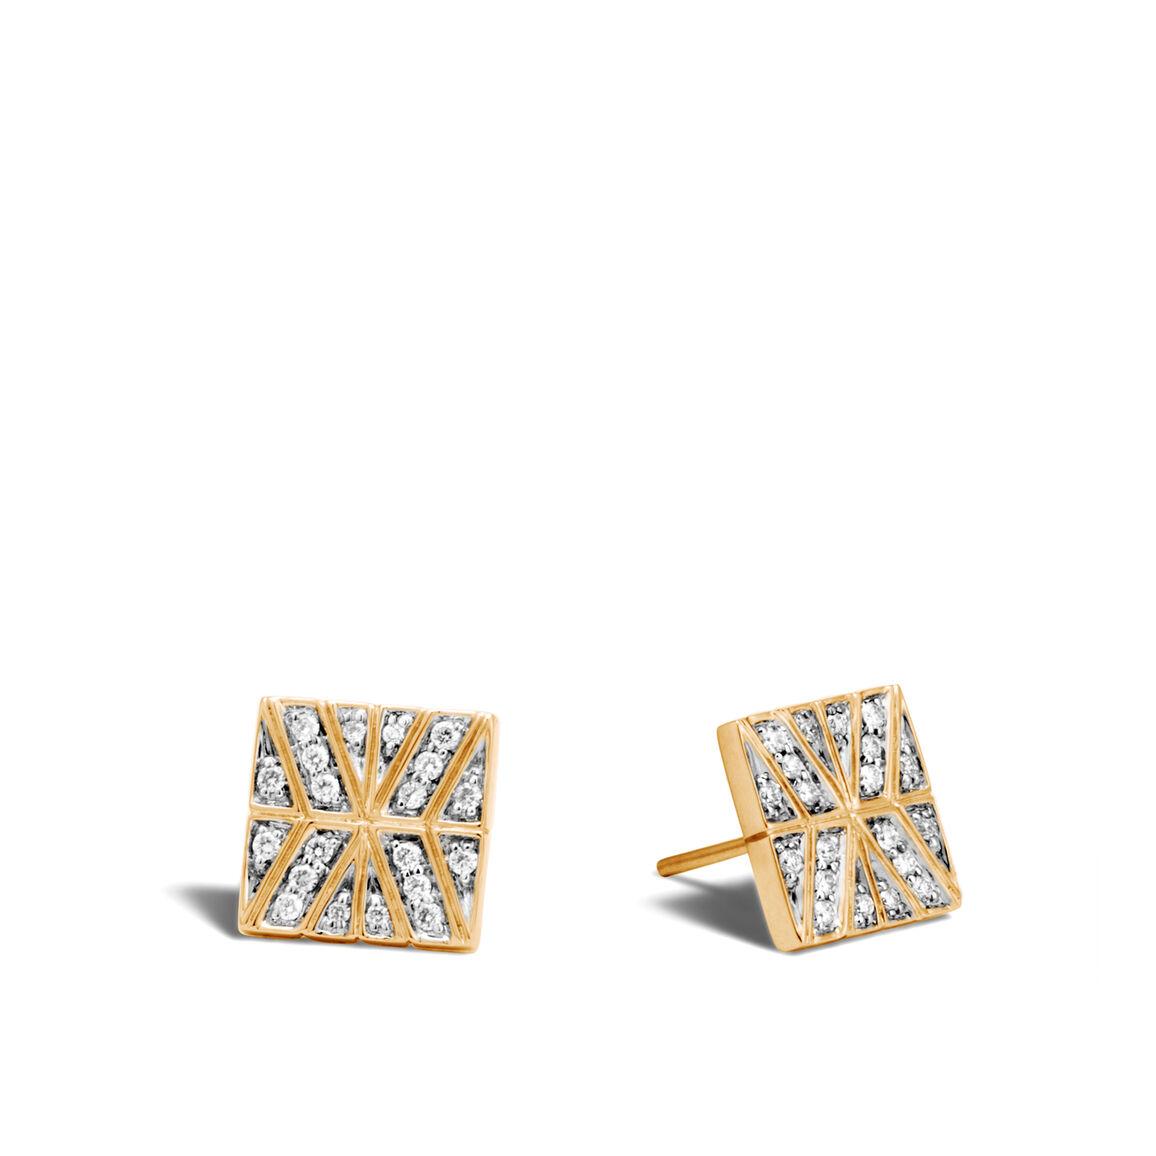 Modern Chain Stud Earrings in 18K Gold with Diamonds